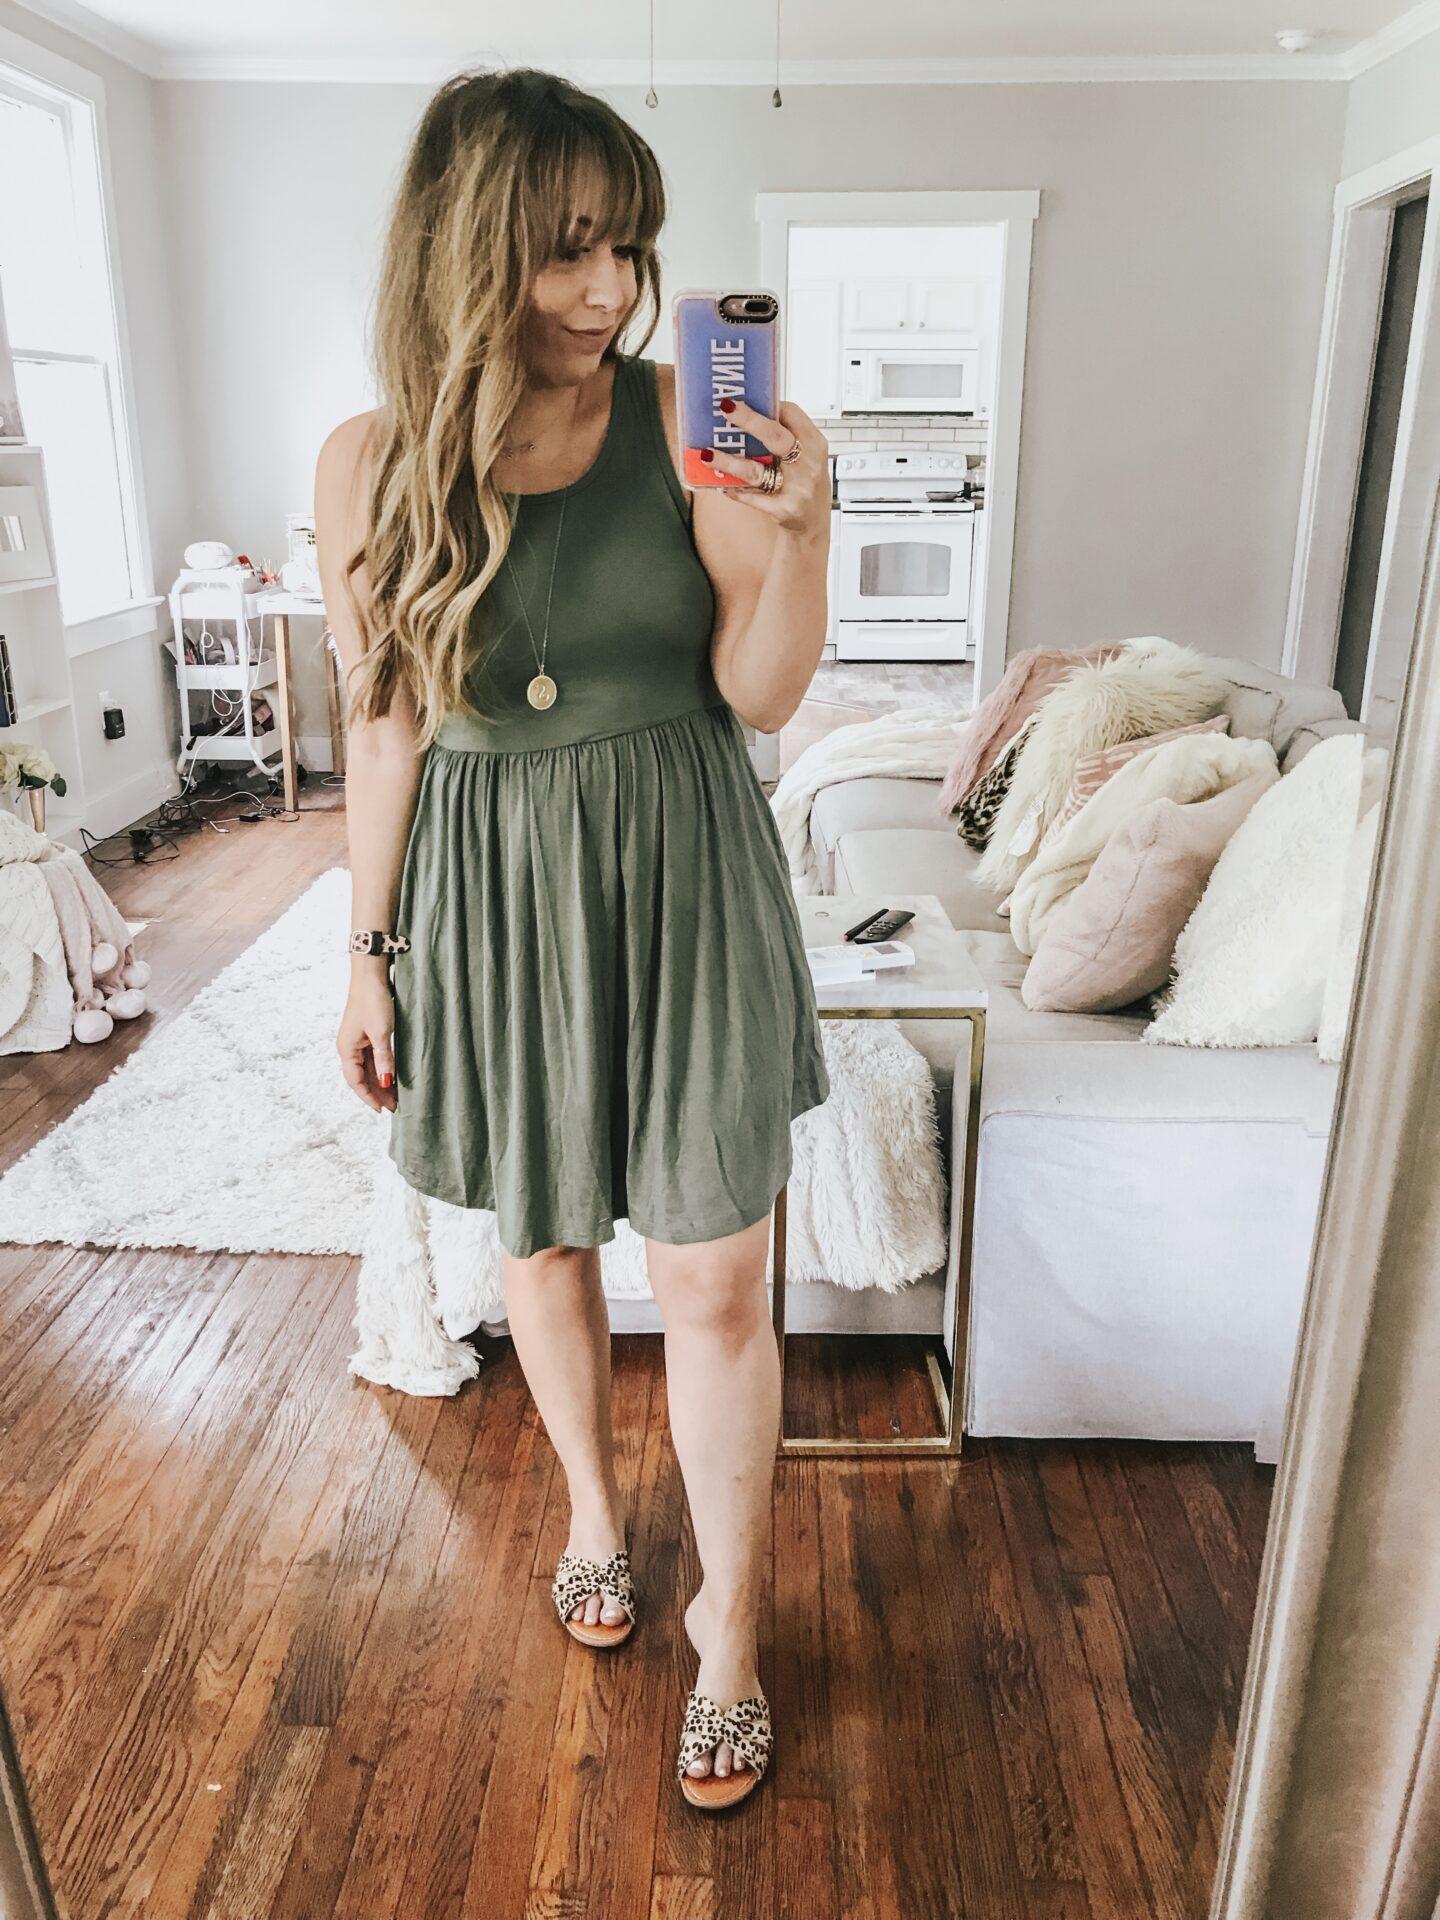 Cute Amazon tank dress